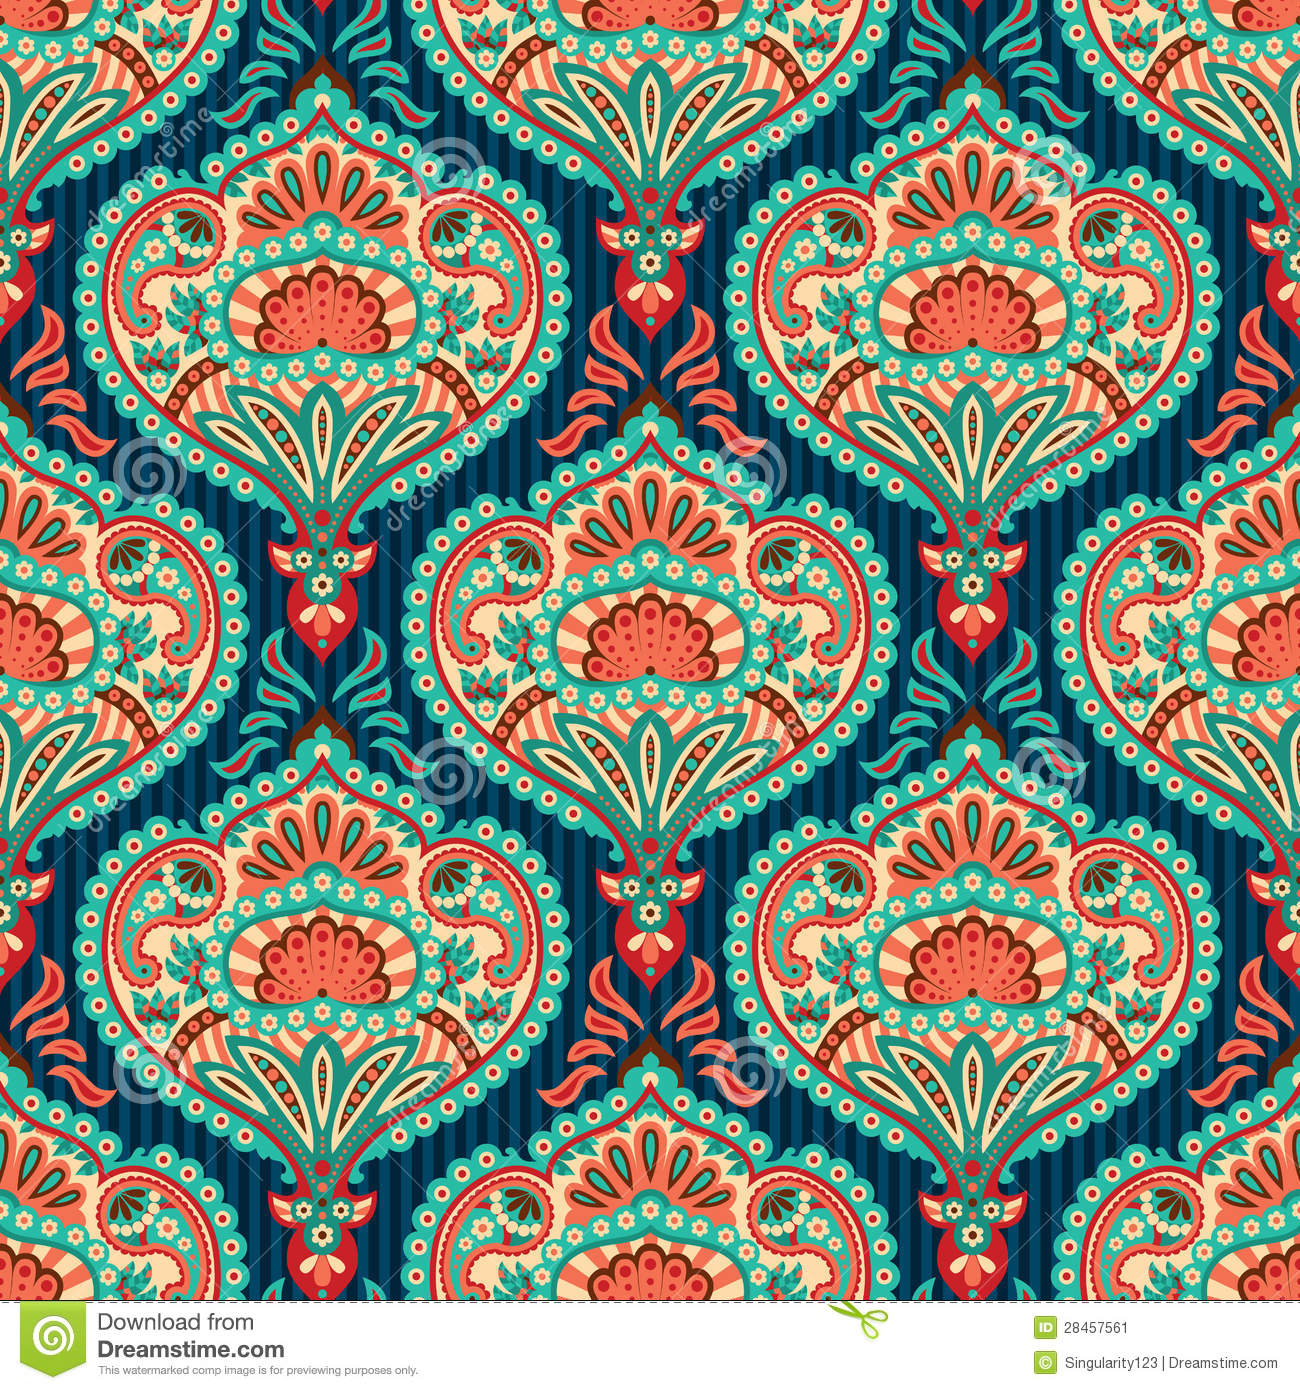 Indie Pattern Tumblr Paisley pattern wallpaper 1300x1390